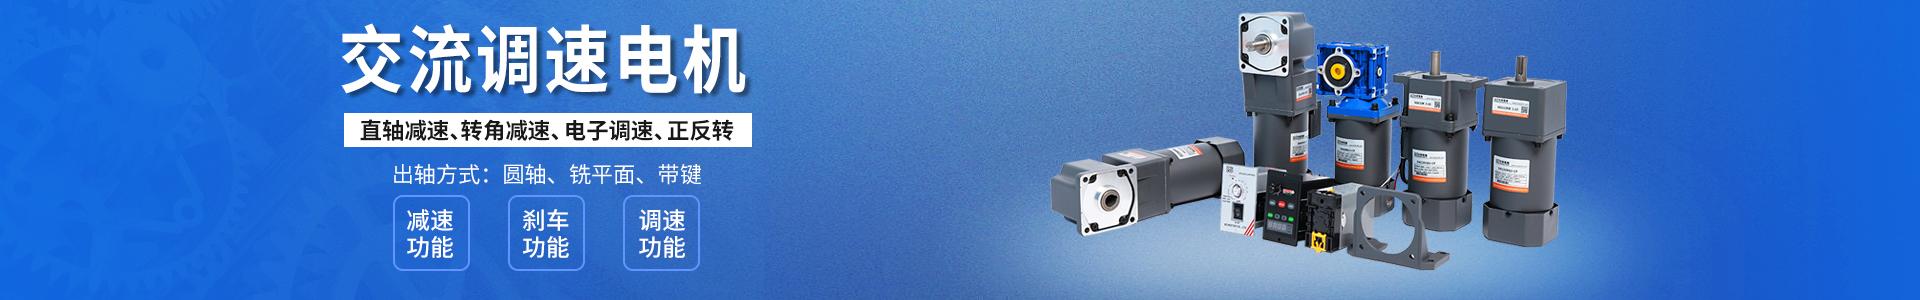 60W紫外线消毒器电机,5IK60RGN-CF+5GN5K调速电机